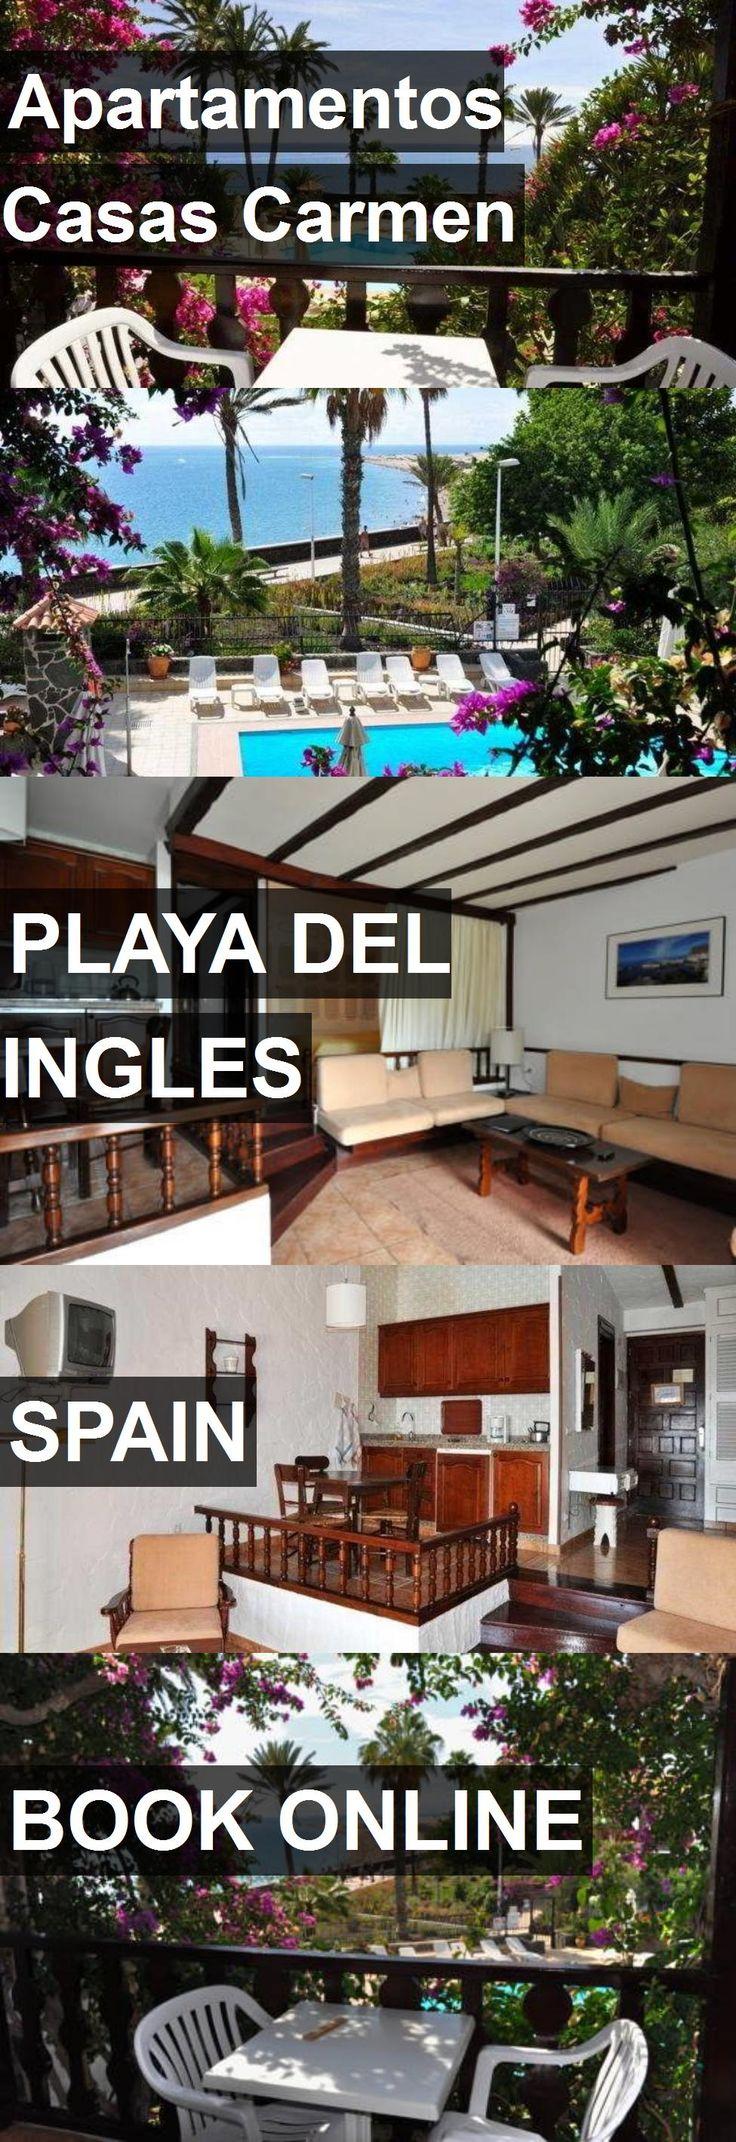 Hotel Apartamentos Casas Carmen in Playa del Ingles, Spain. For more information, photos, reviews and best prices please follow the link. #Spain #PlayadelIngles #ApartamentosCasasCarmen #hotel #travel #vacation